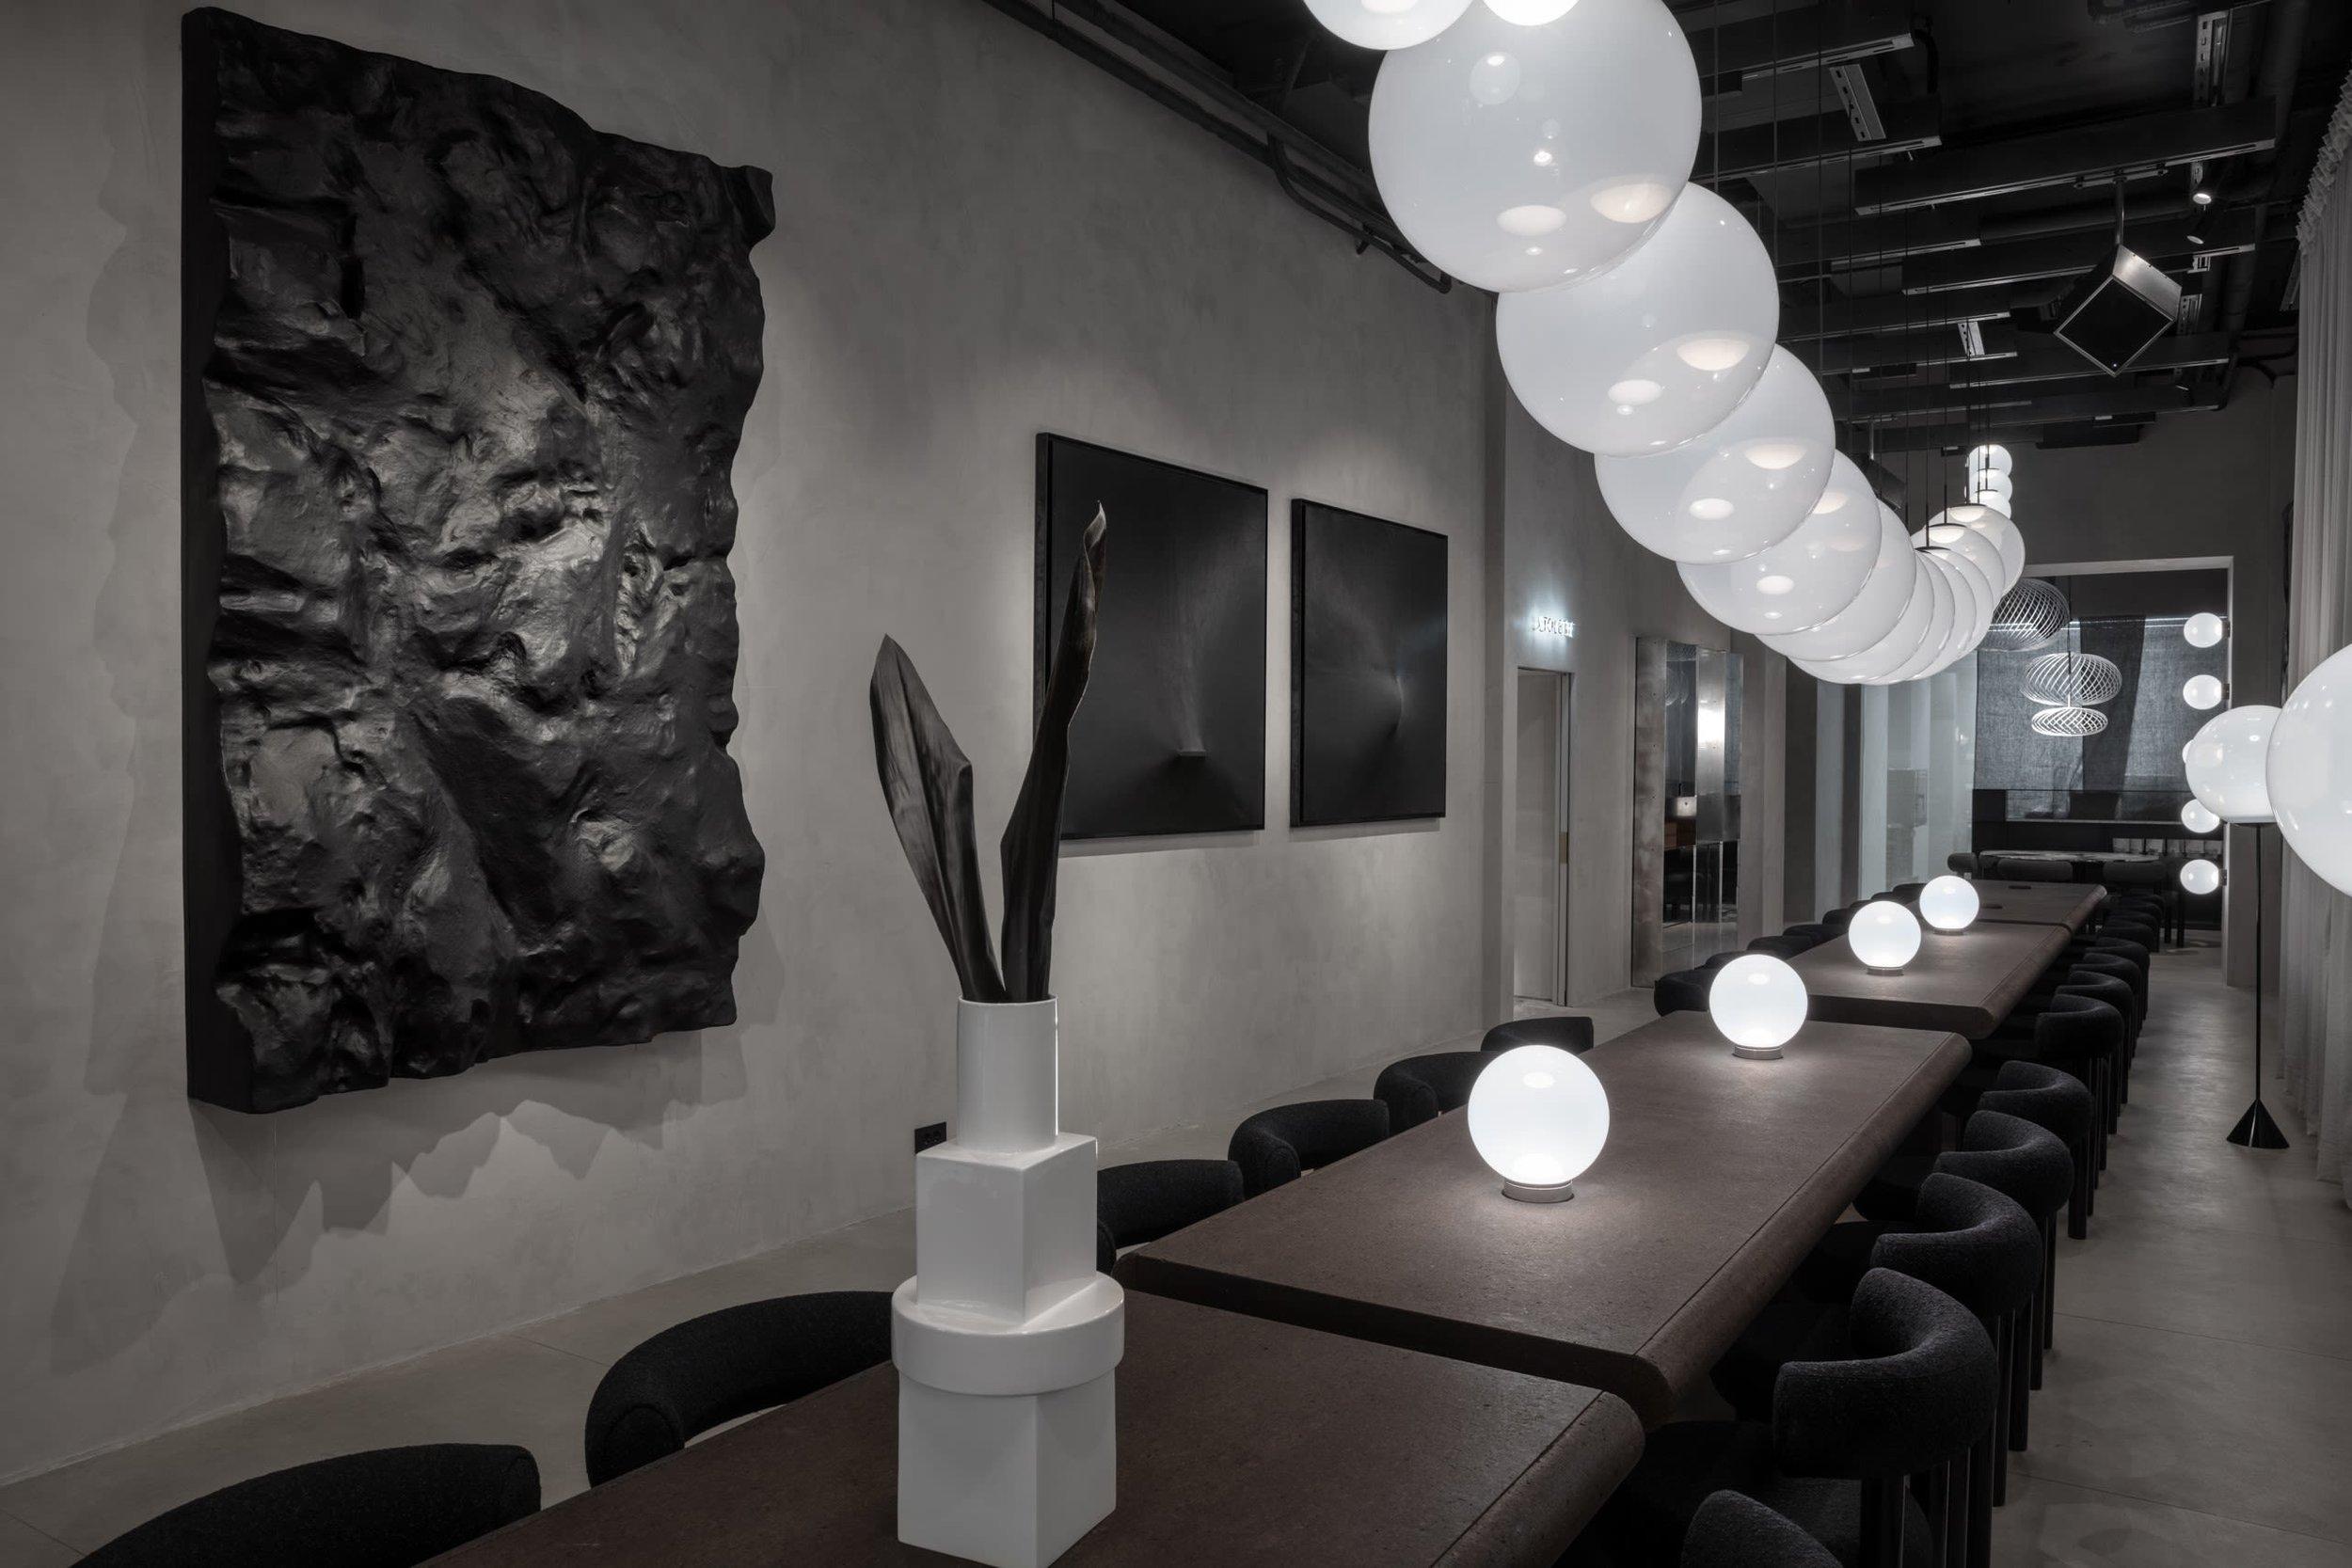 The Manzoni dining room. Image via tomdixon.net